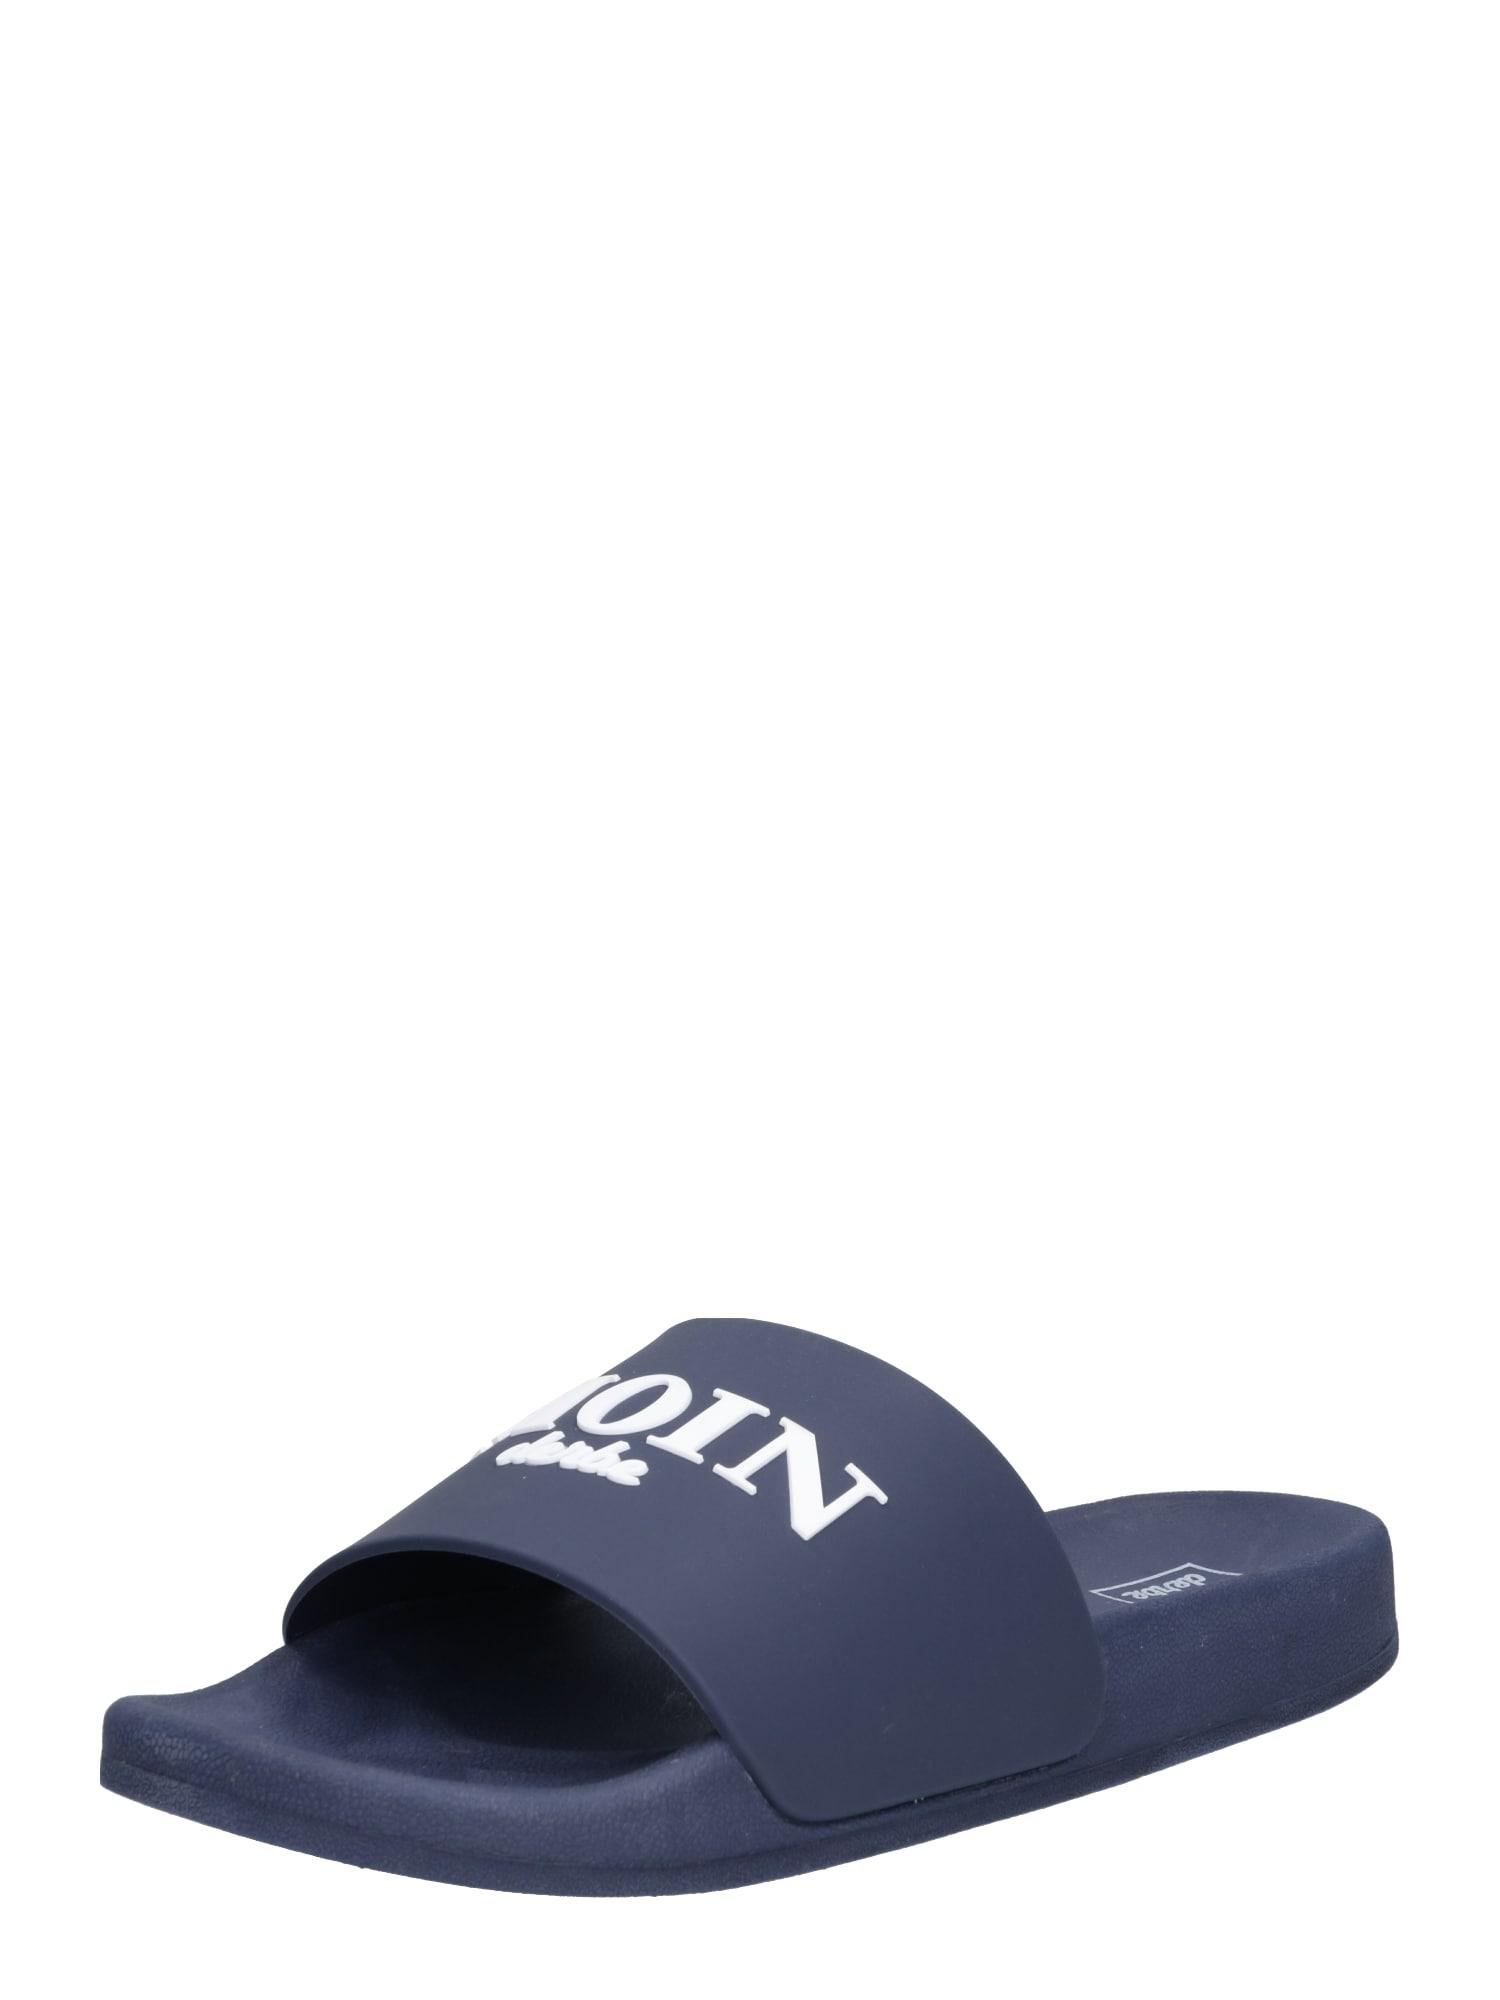 Pantofle Buddellette marine modrá Derbe